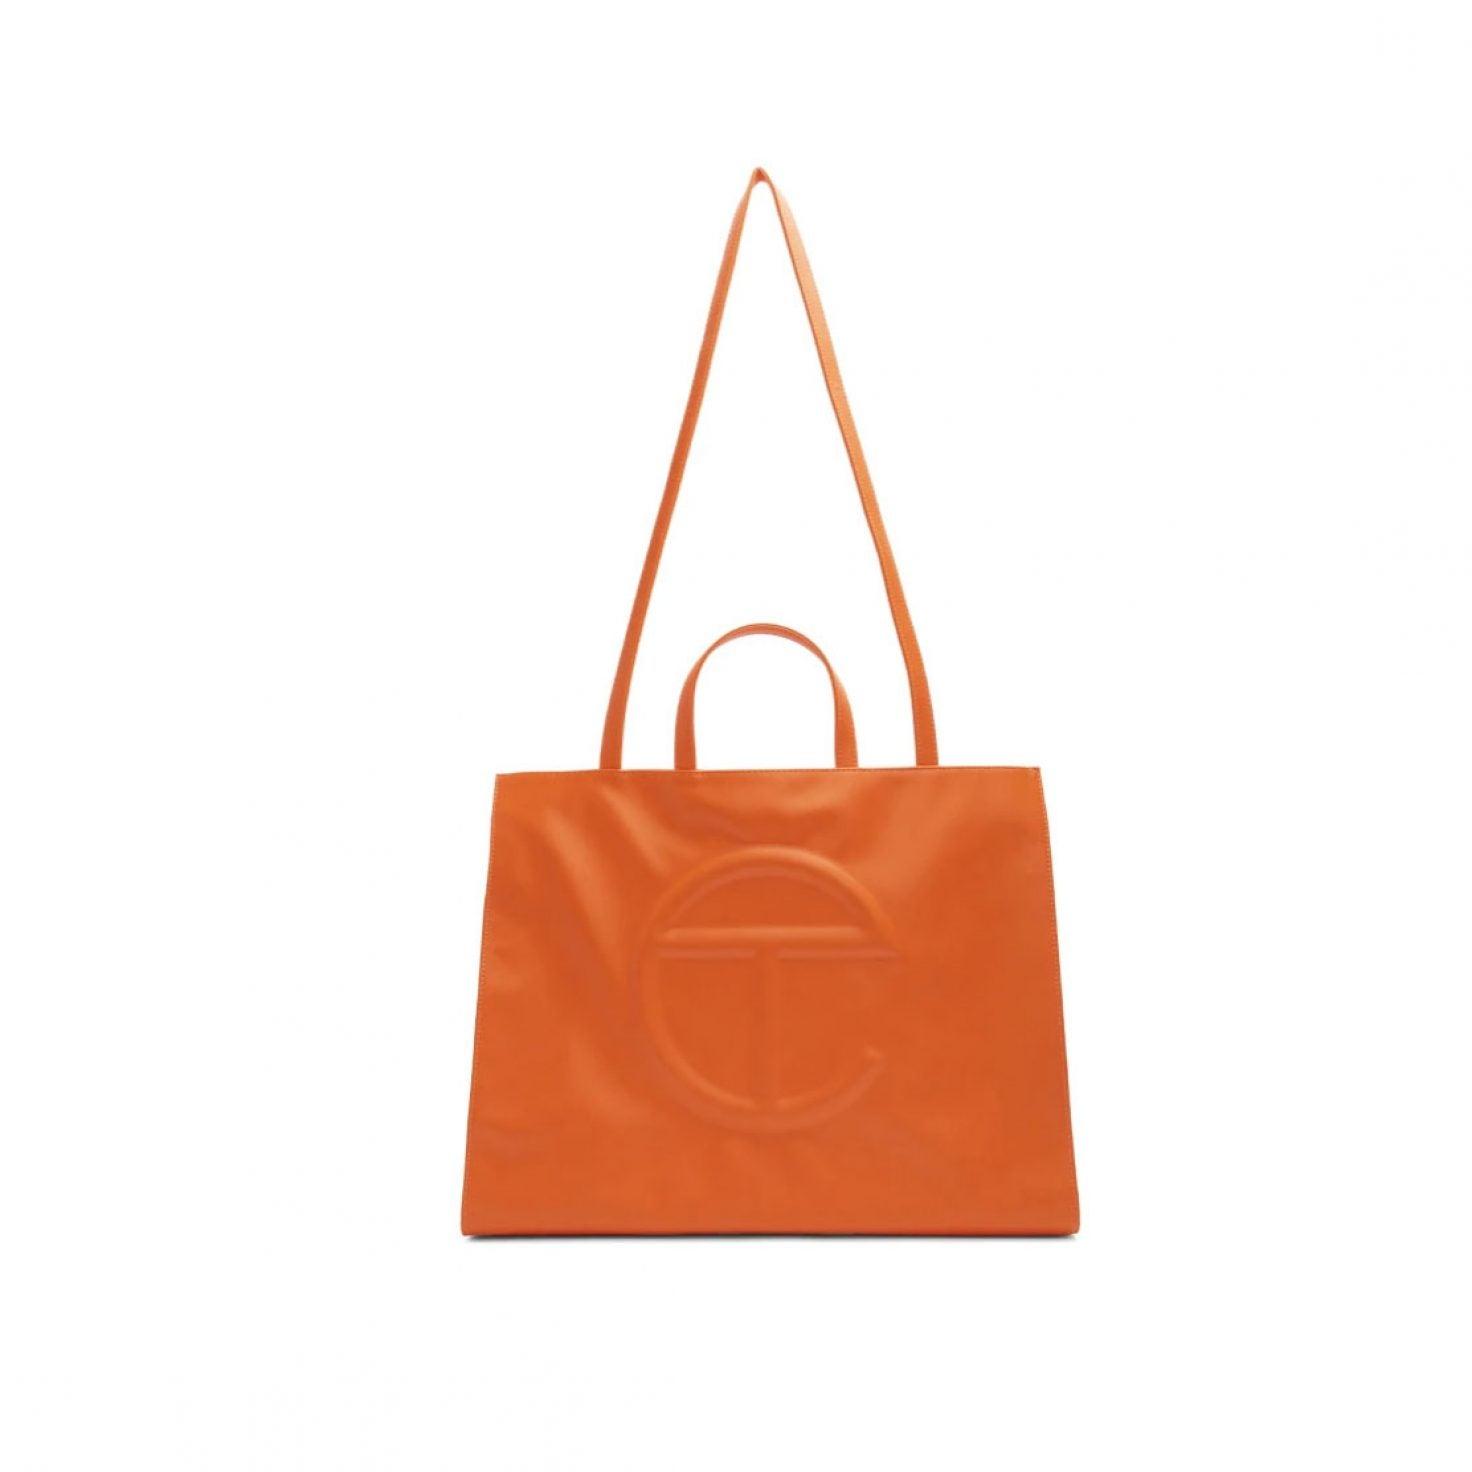 Editor's Pick: Telfar x Ssense Exclusive Shopping Bag